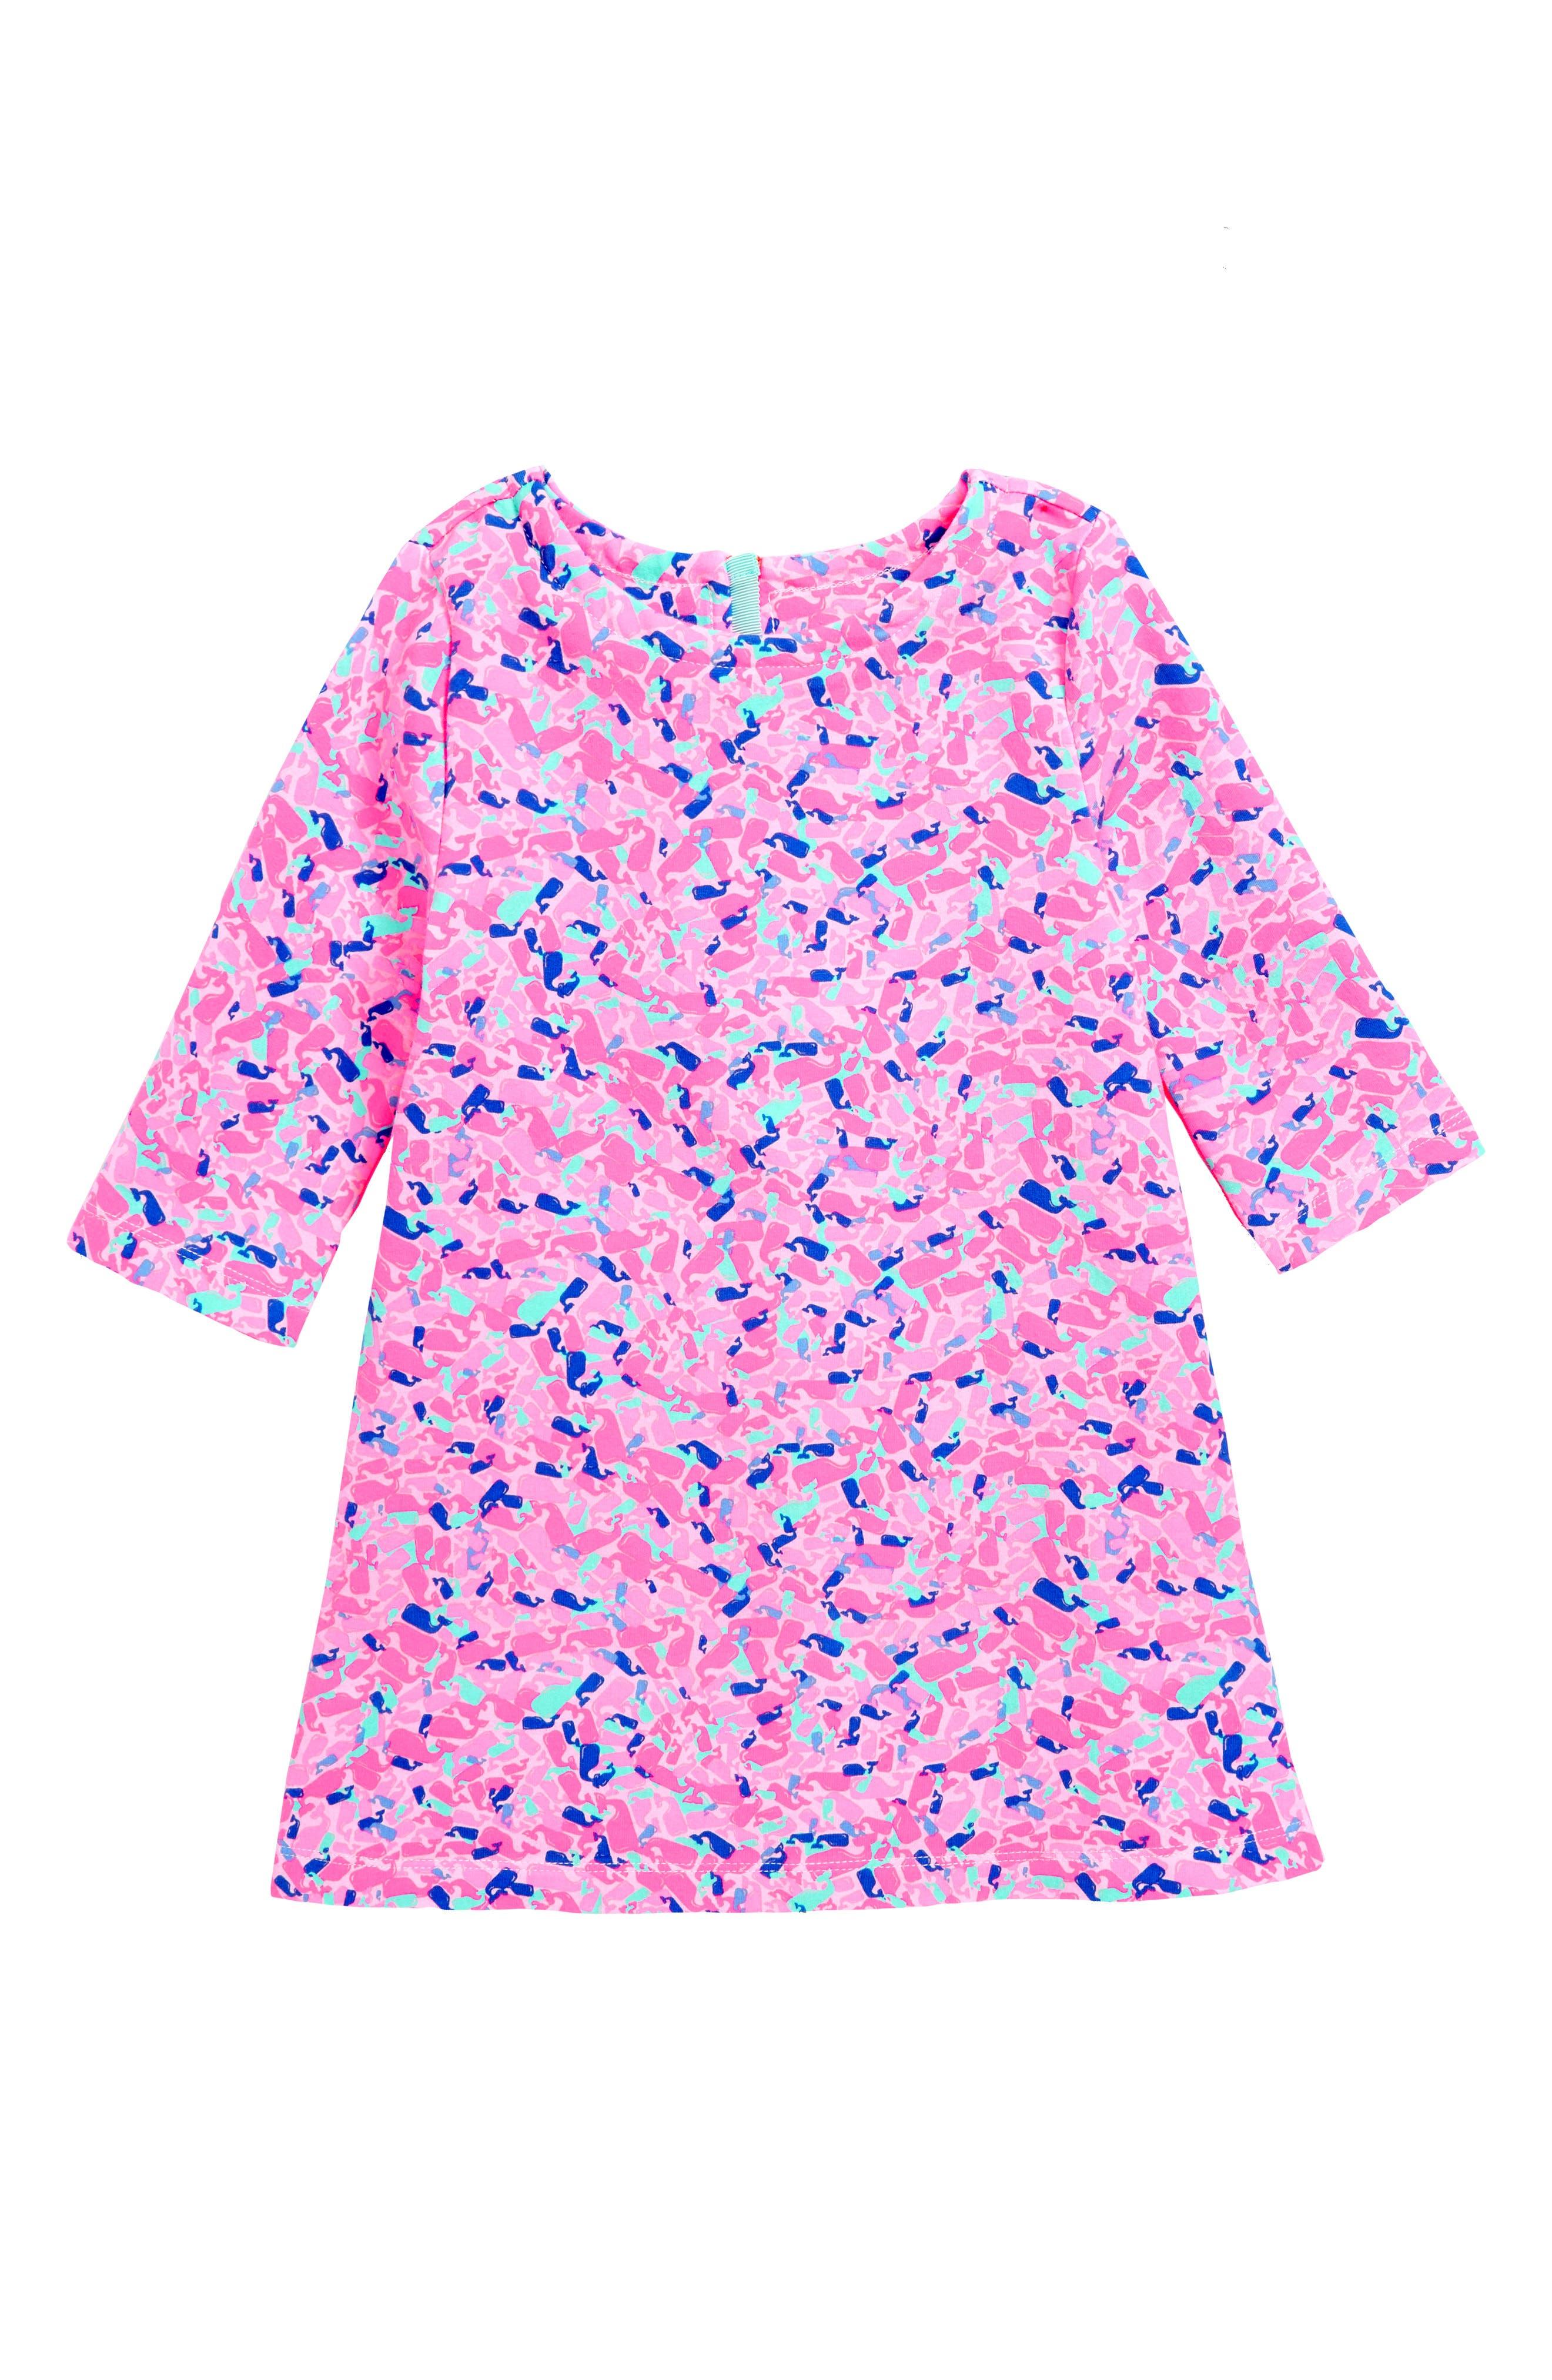 Whale Swirl Dress,                         Main,                         color, 650